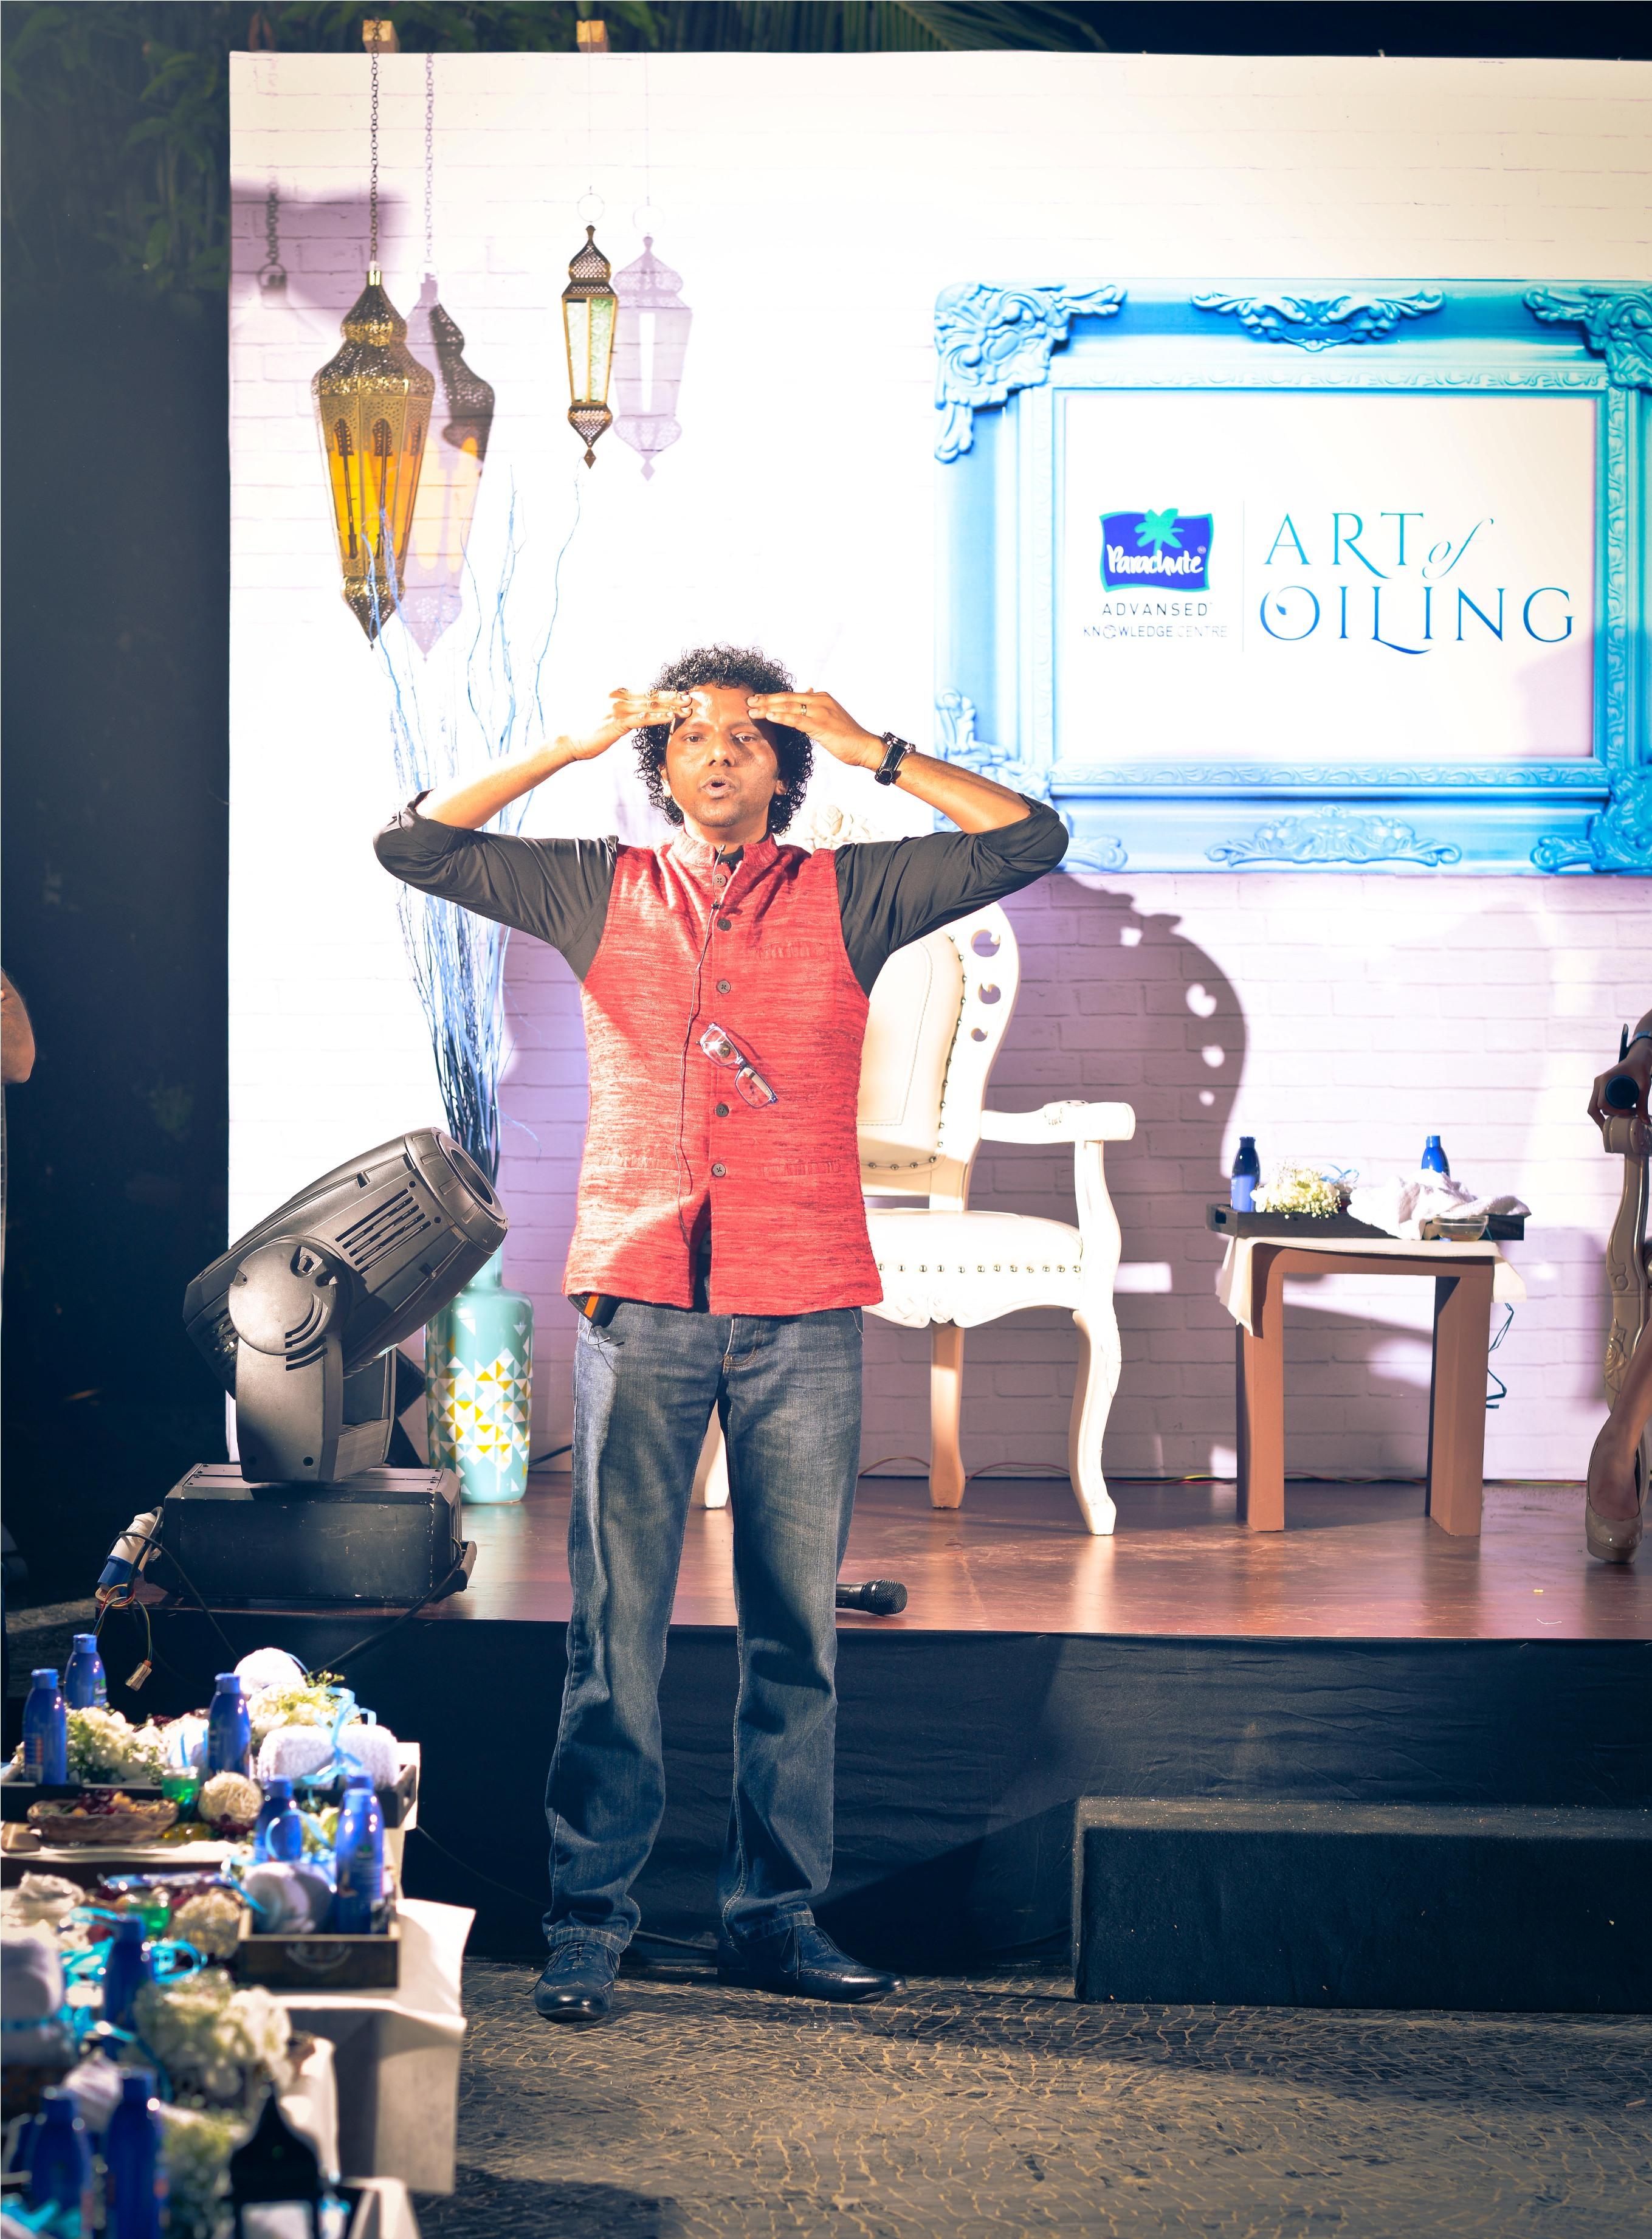 Moses Chundi, Parachute's Art Of Oiling Brand Ambassador